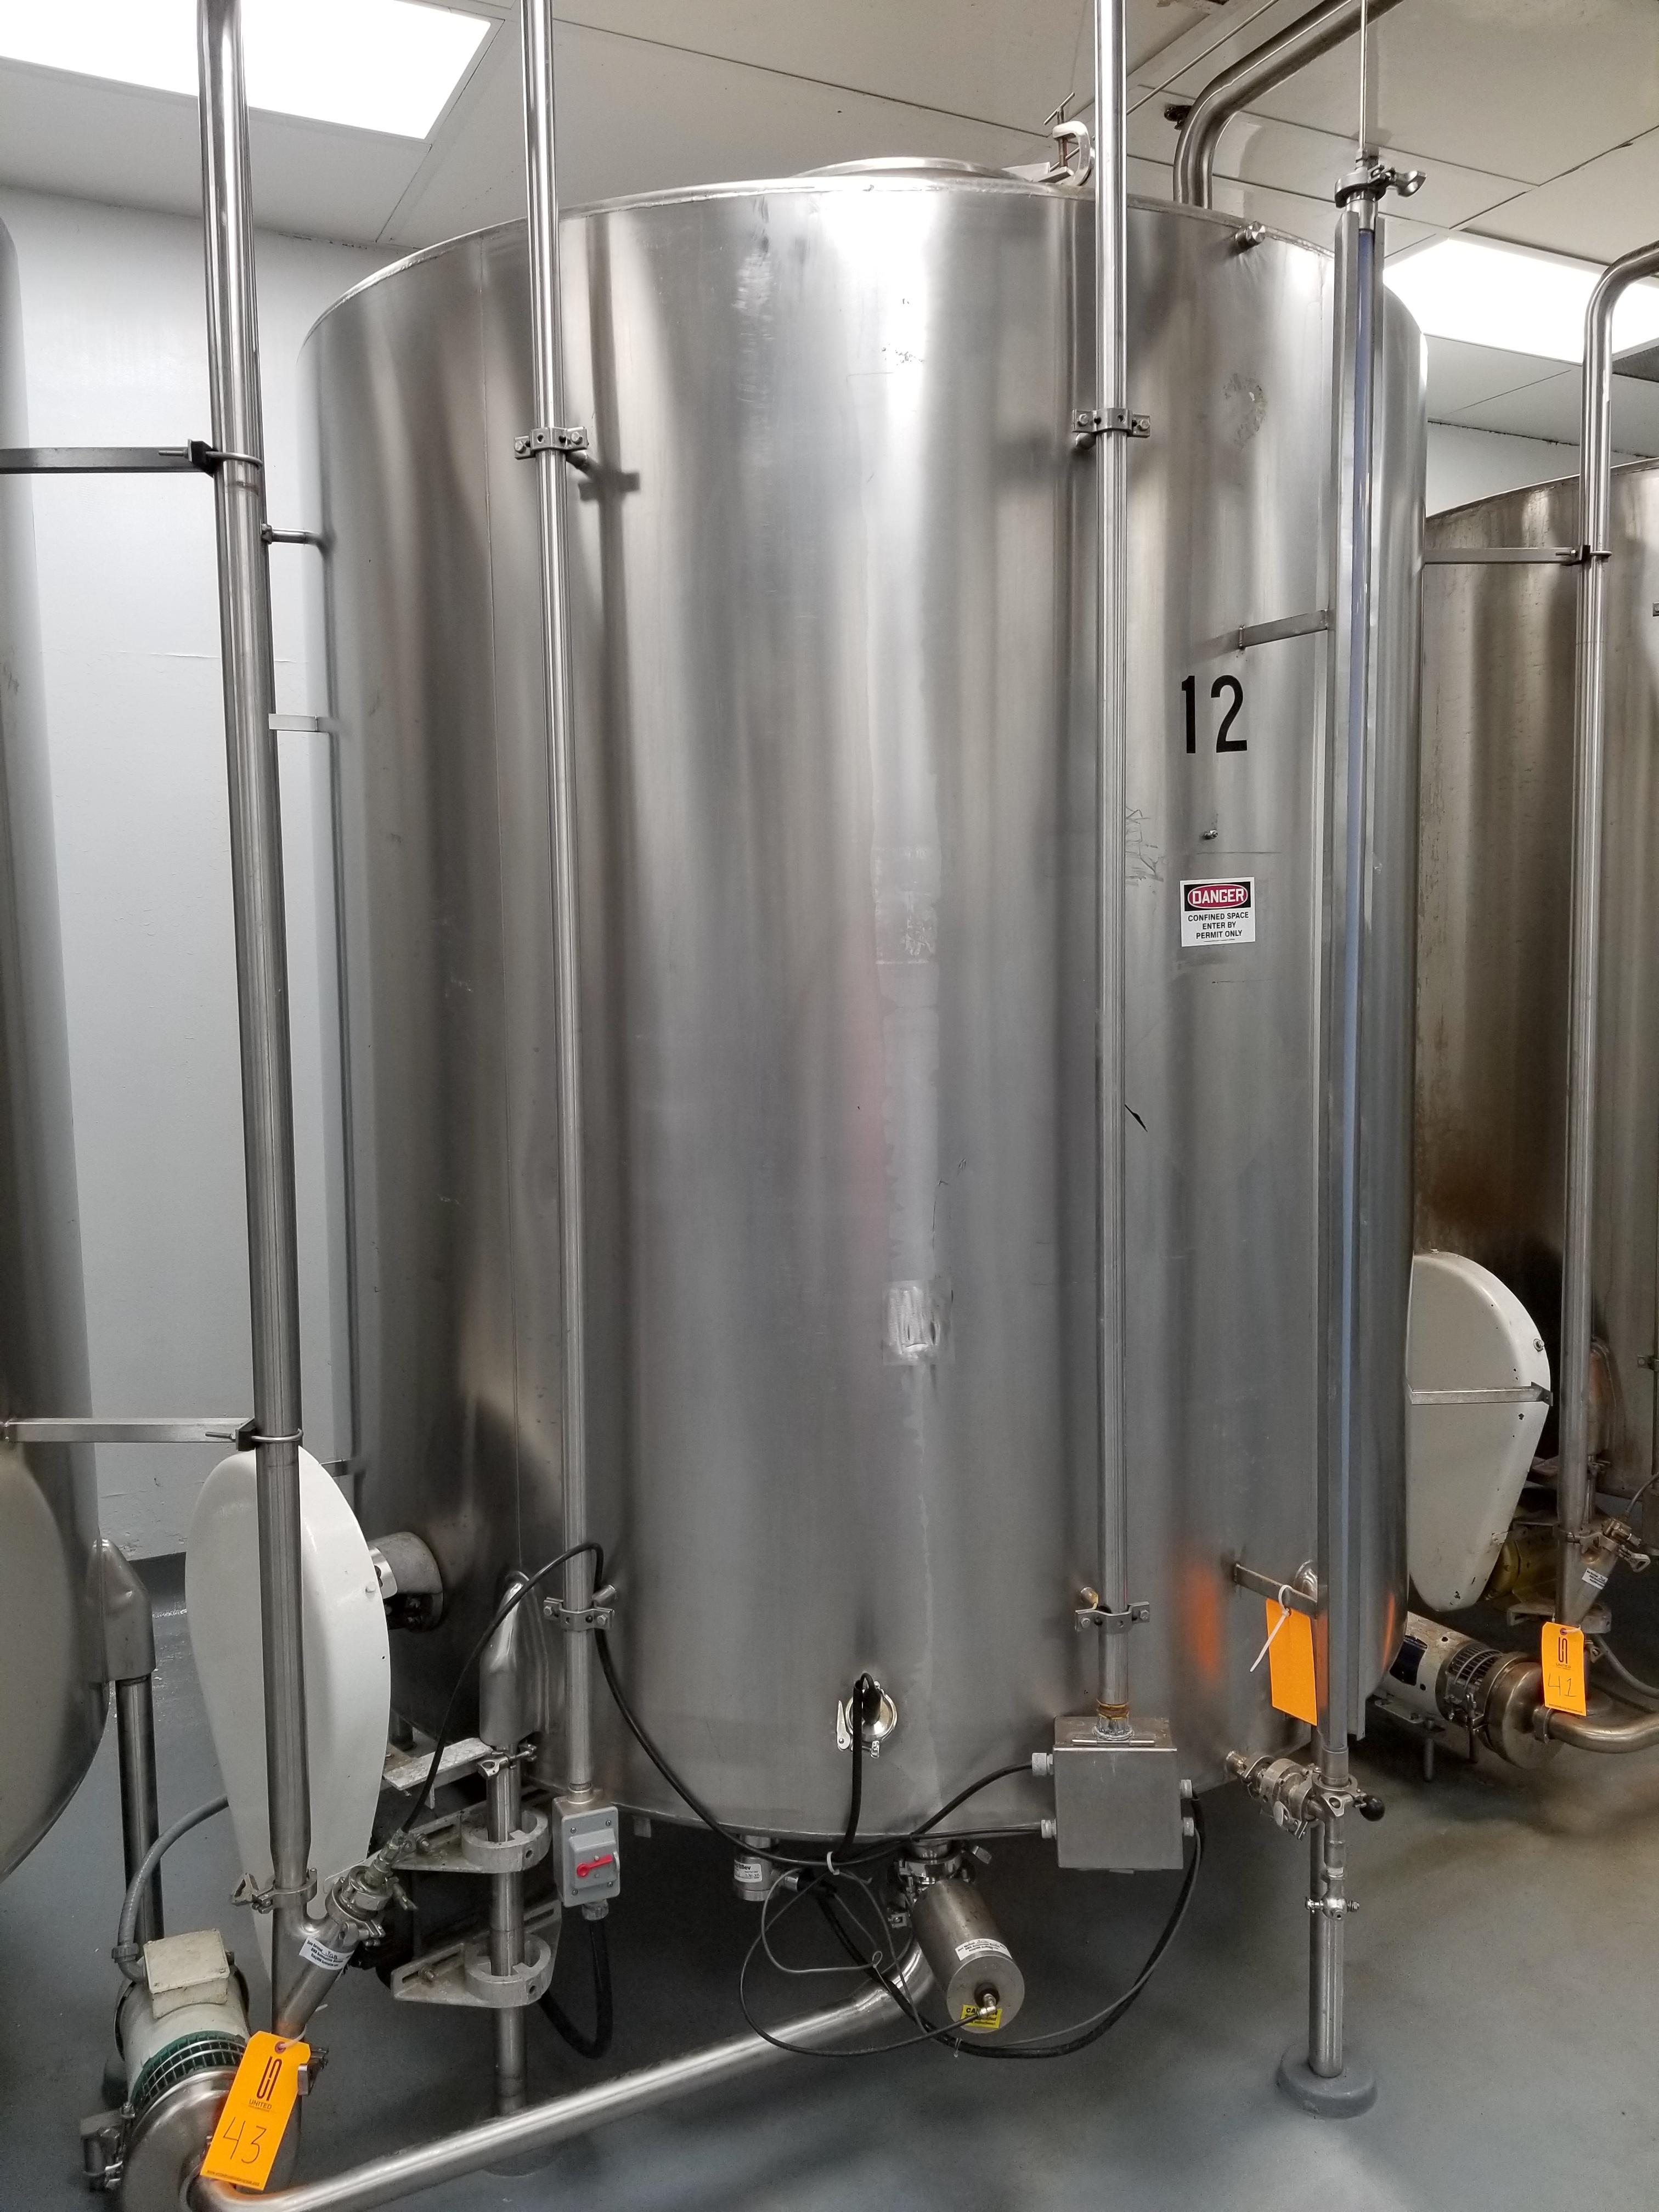 Chem Tank 2,000 Gallon Vertical Mixing Tank - Image 2 of 6